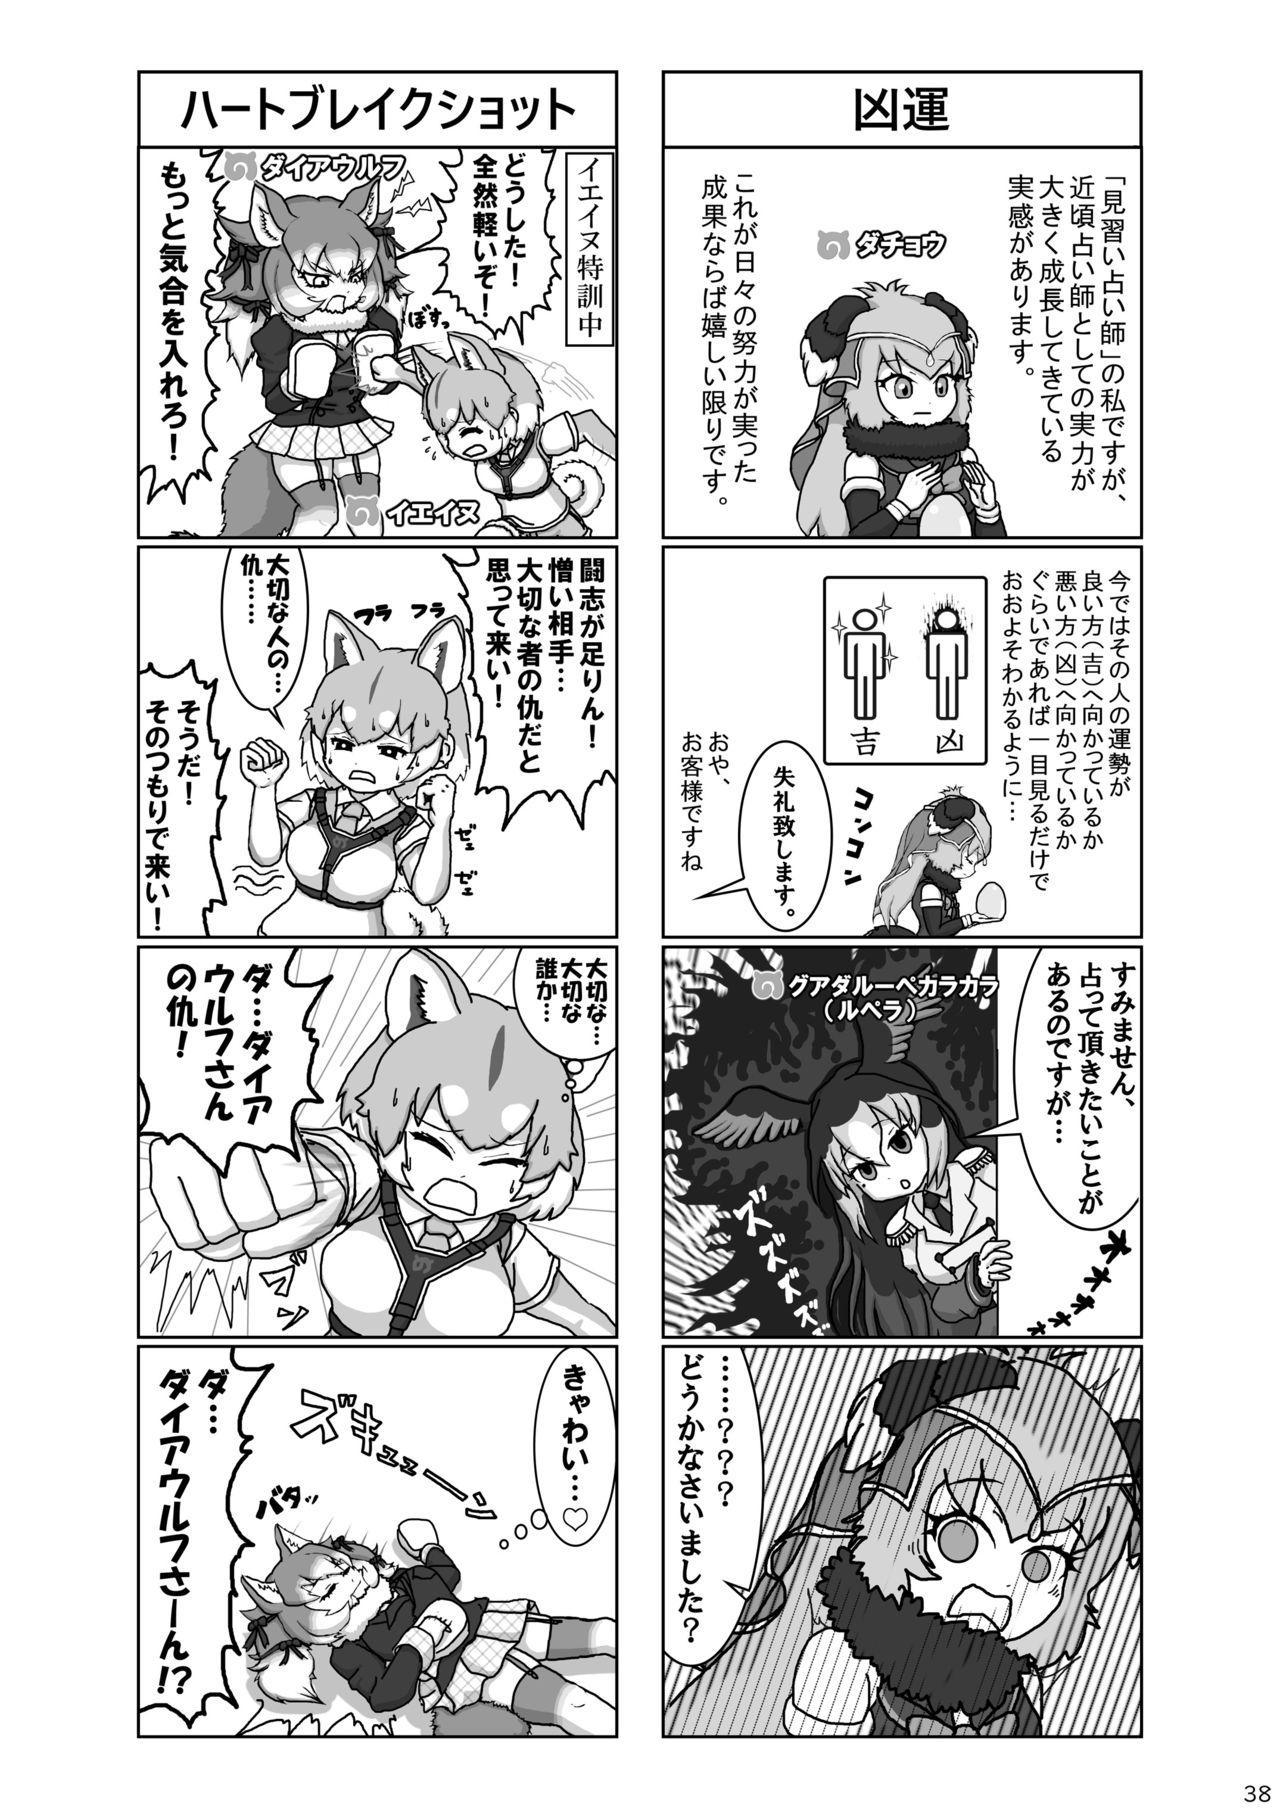 may Kemono Friends Thre Goudoushi 2 39